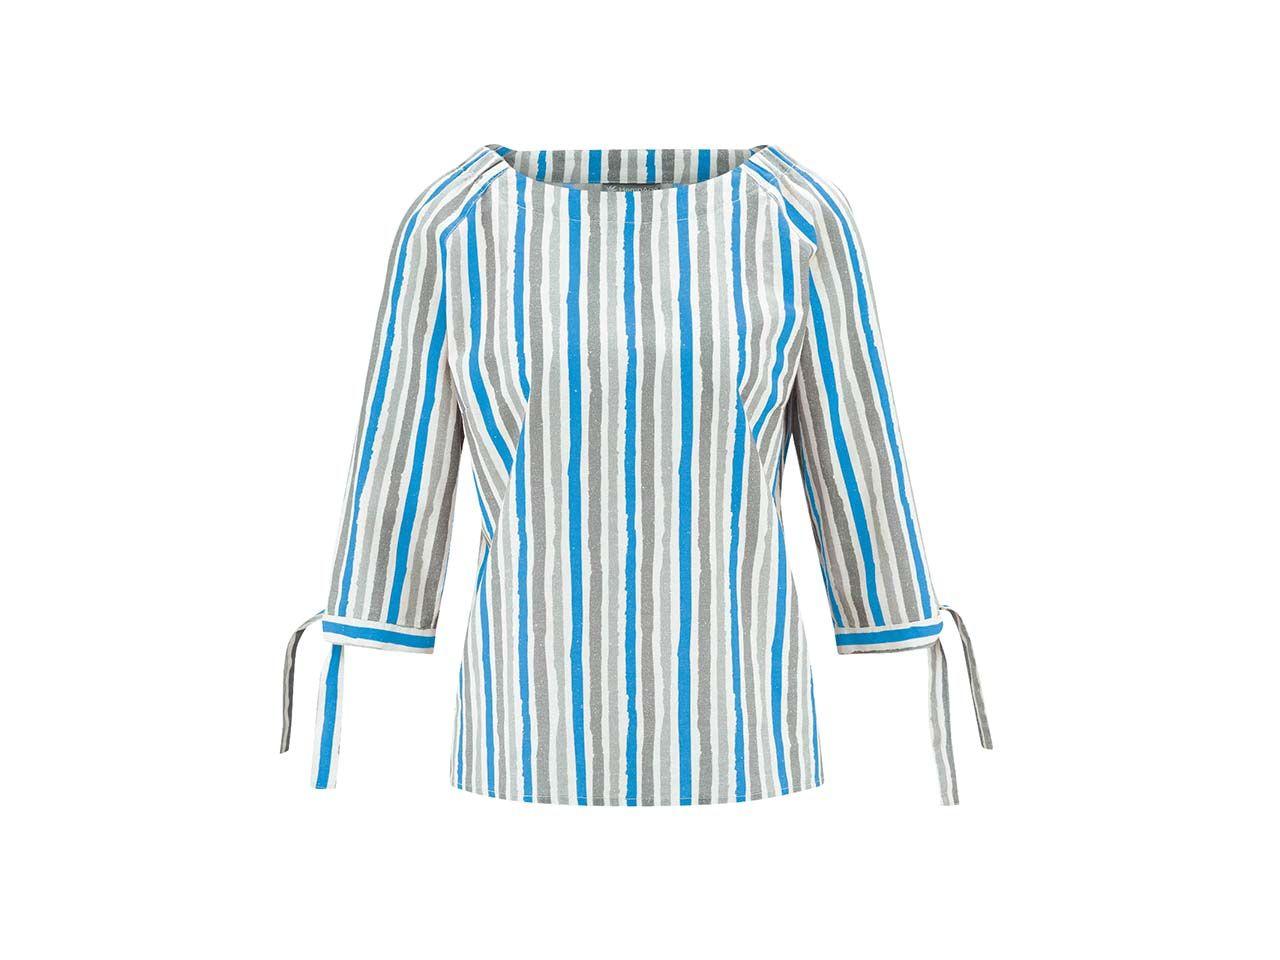 HempAge Damen-Bluse Halbarm, topaz, Gr. L DH173OEB